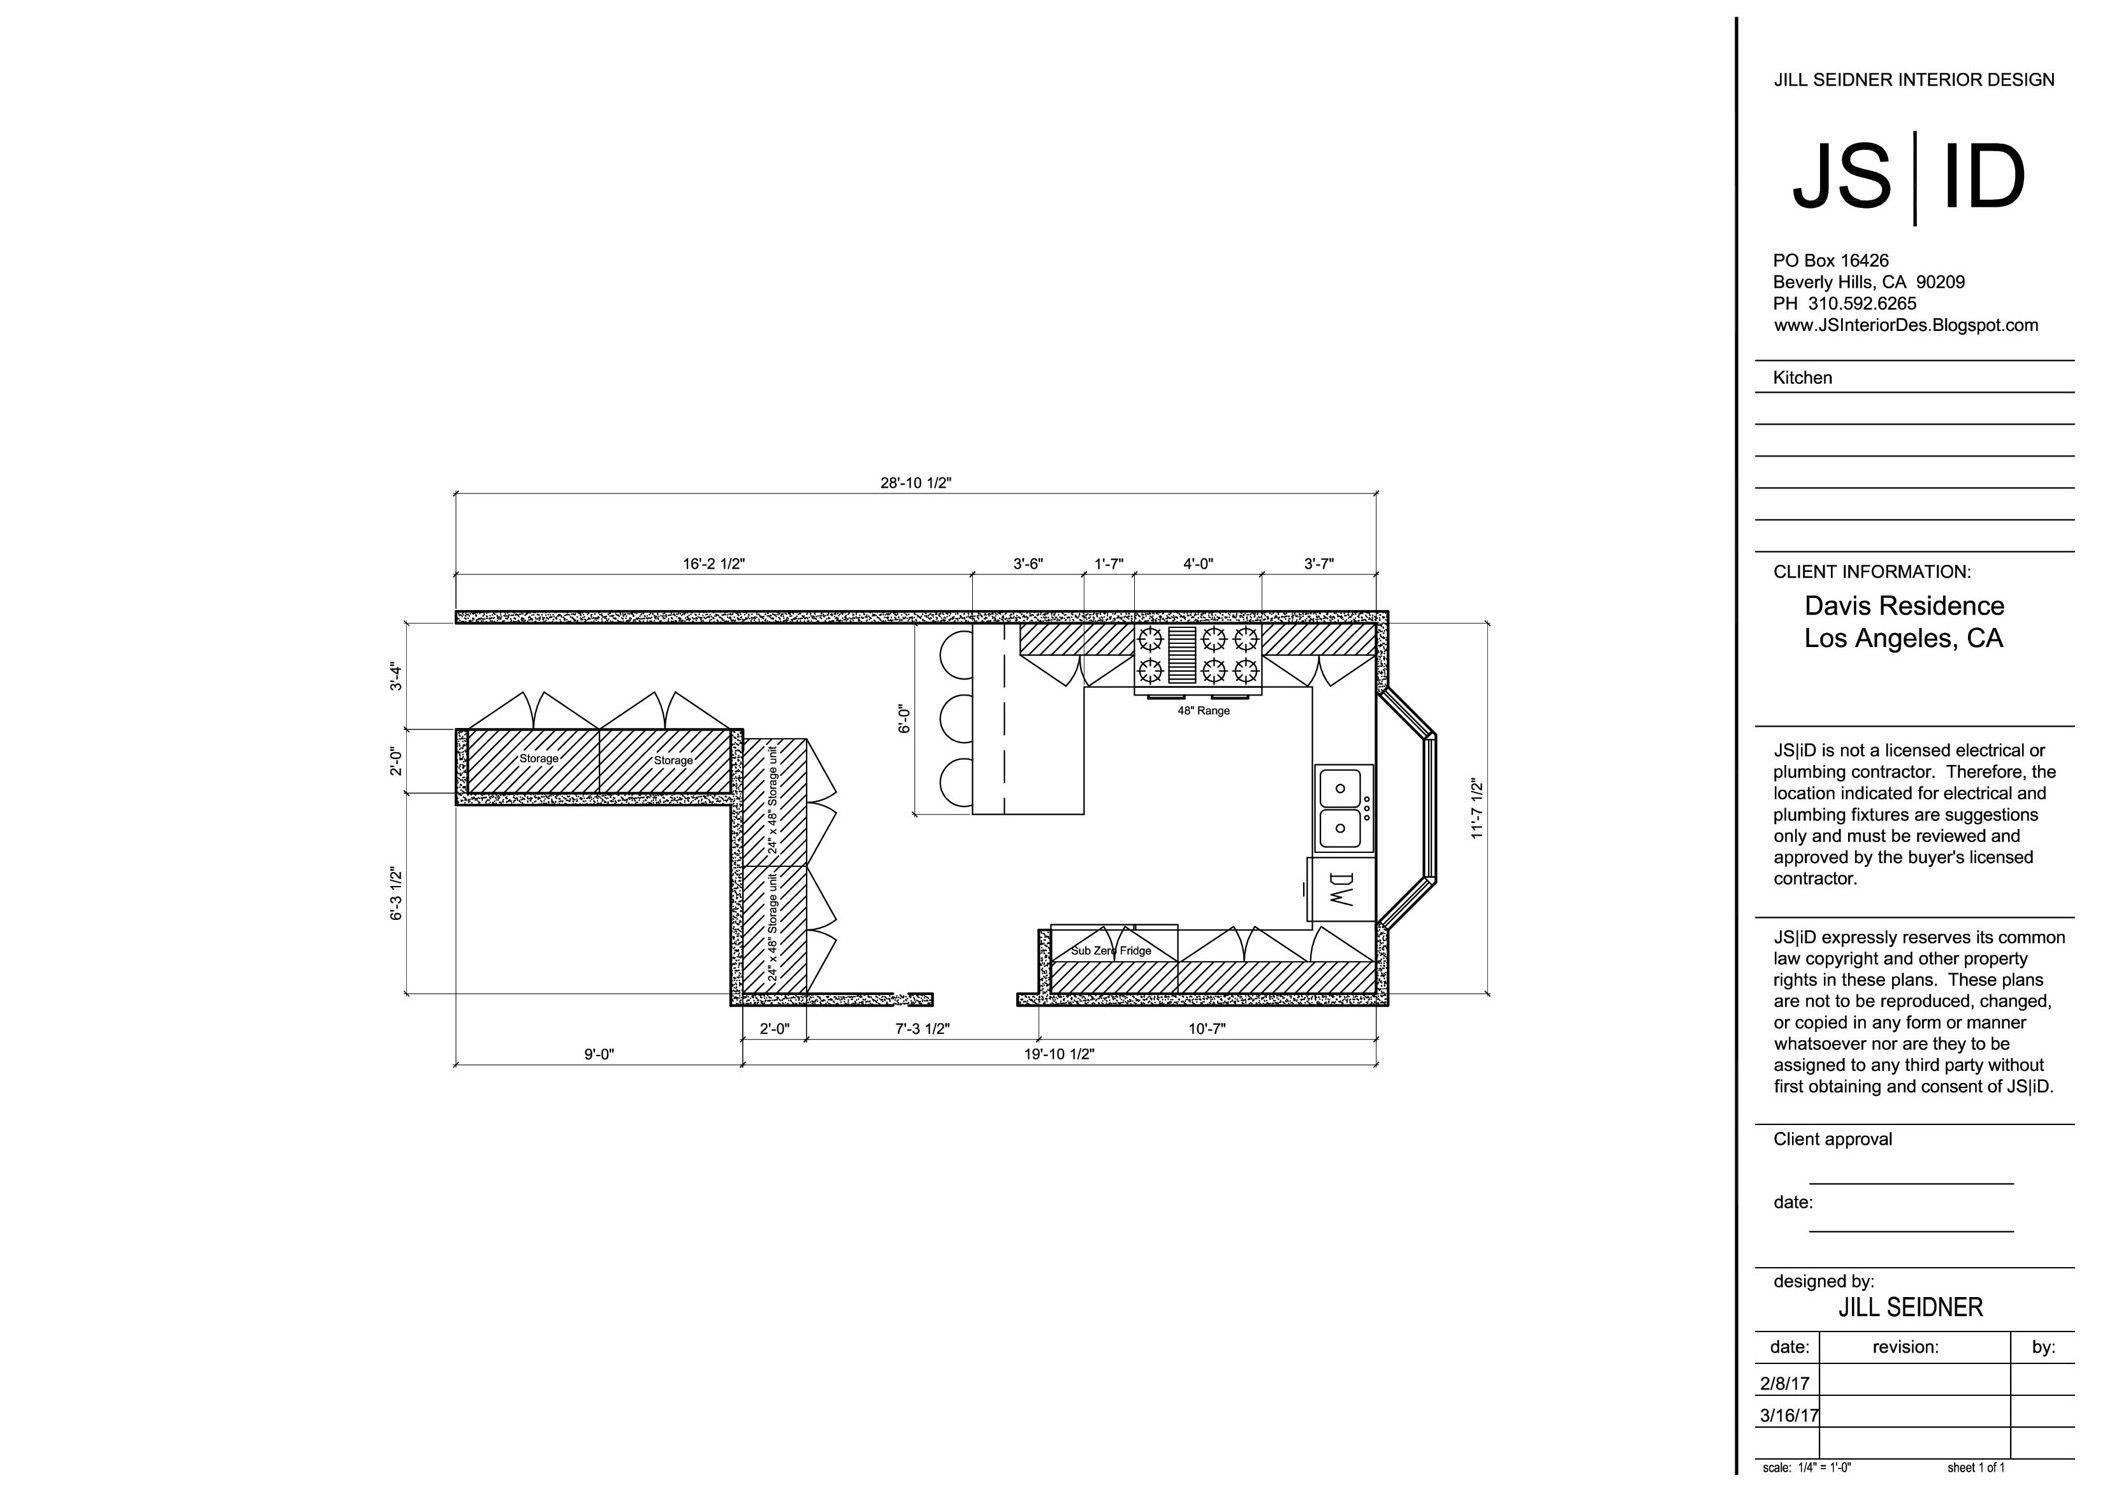 Bel Air, CA Residence Kitchen Remodel Plan Layout, Revised ...